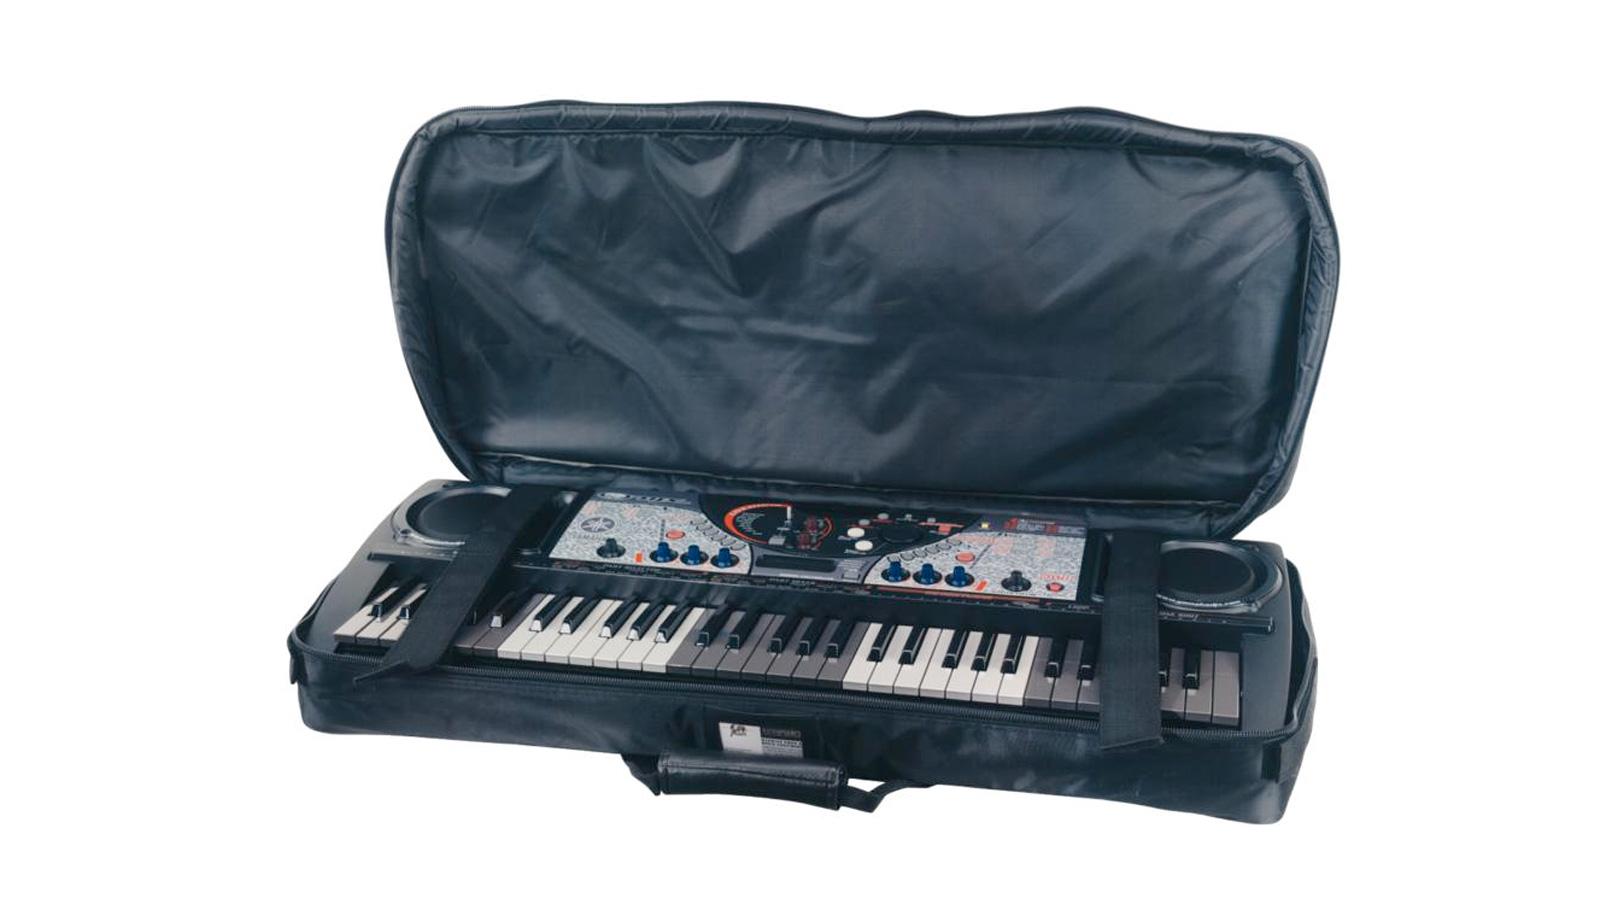 Rockbag RB 21515 B Keyboardtasche